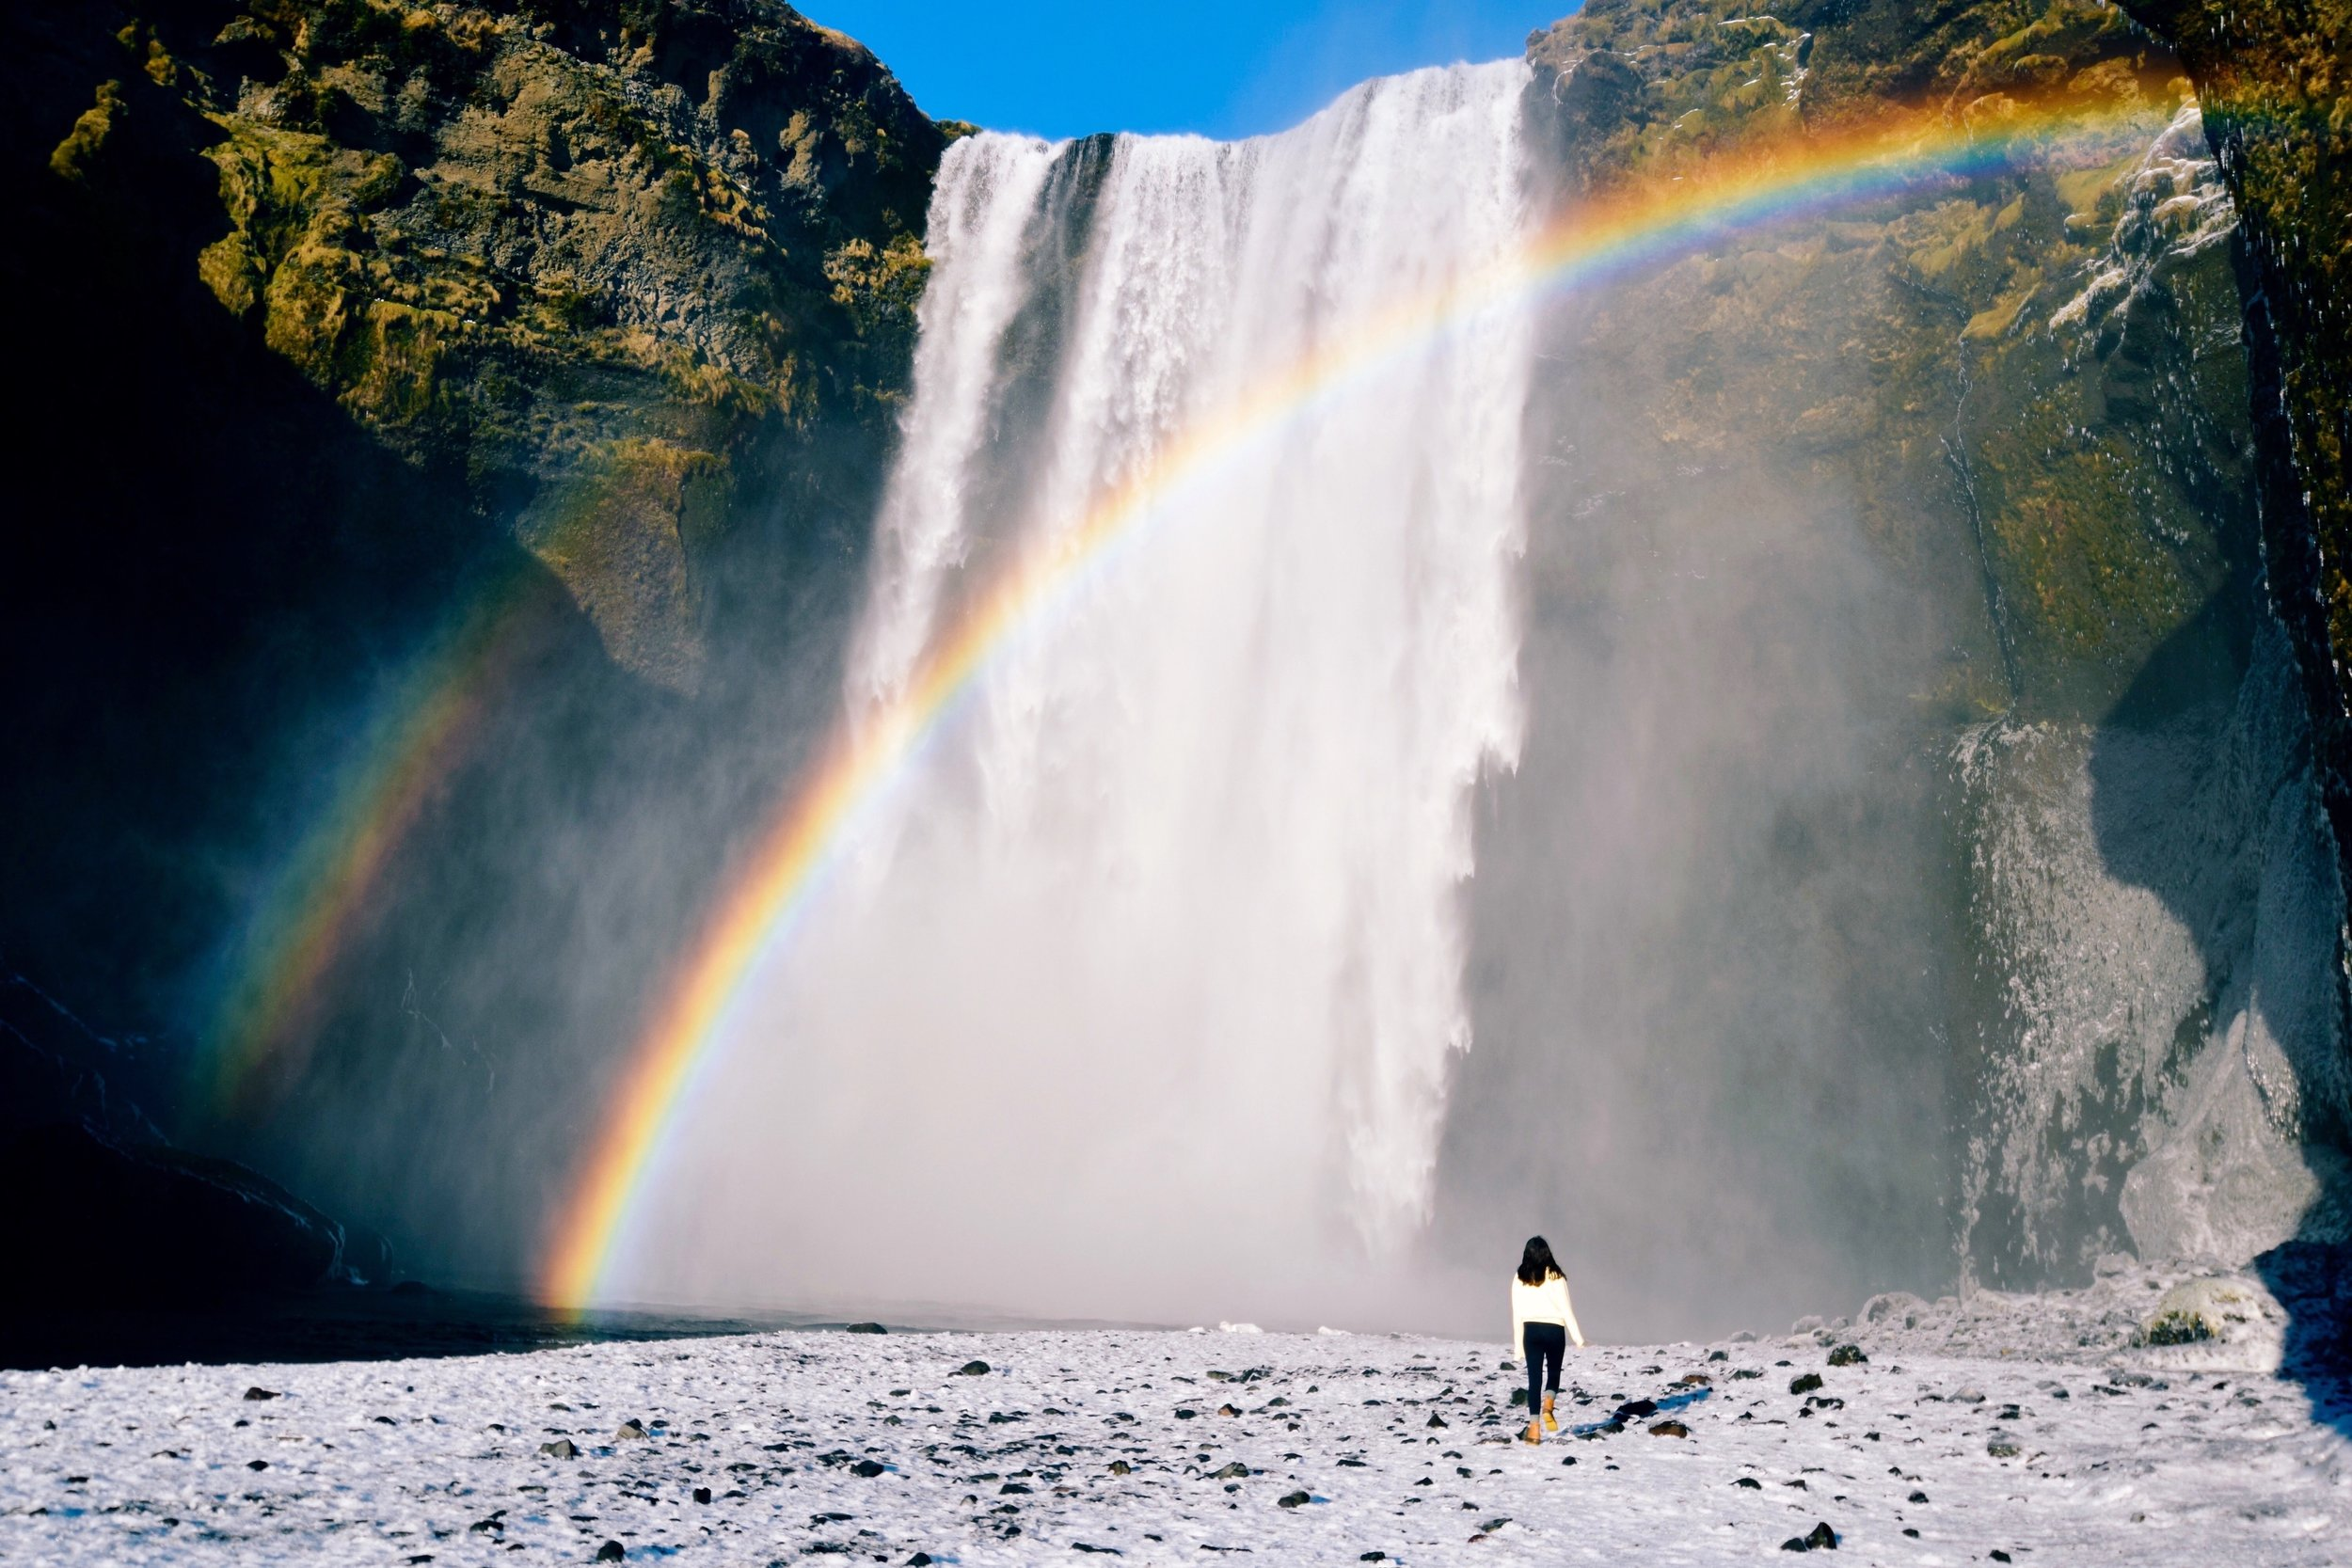 Rainbow over Rangarping, Iceland